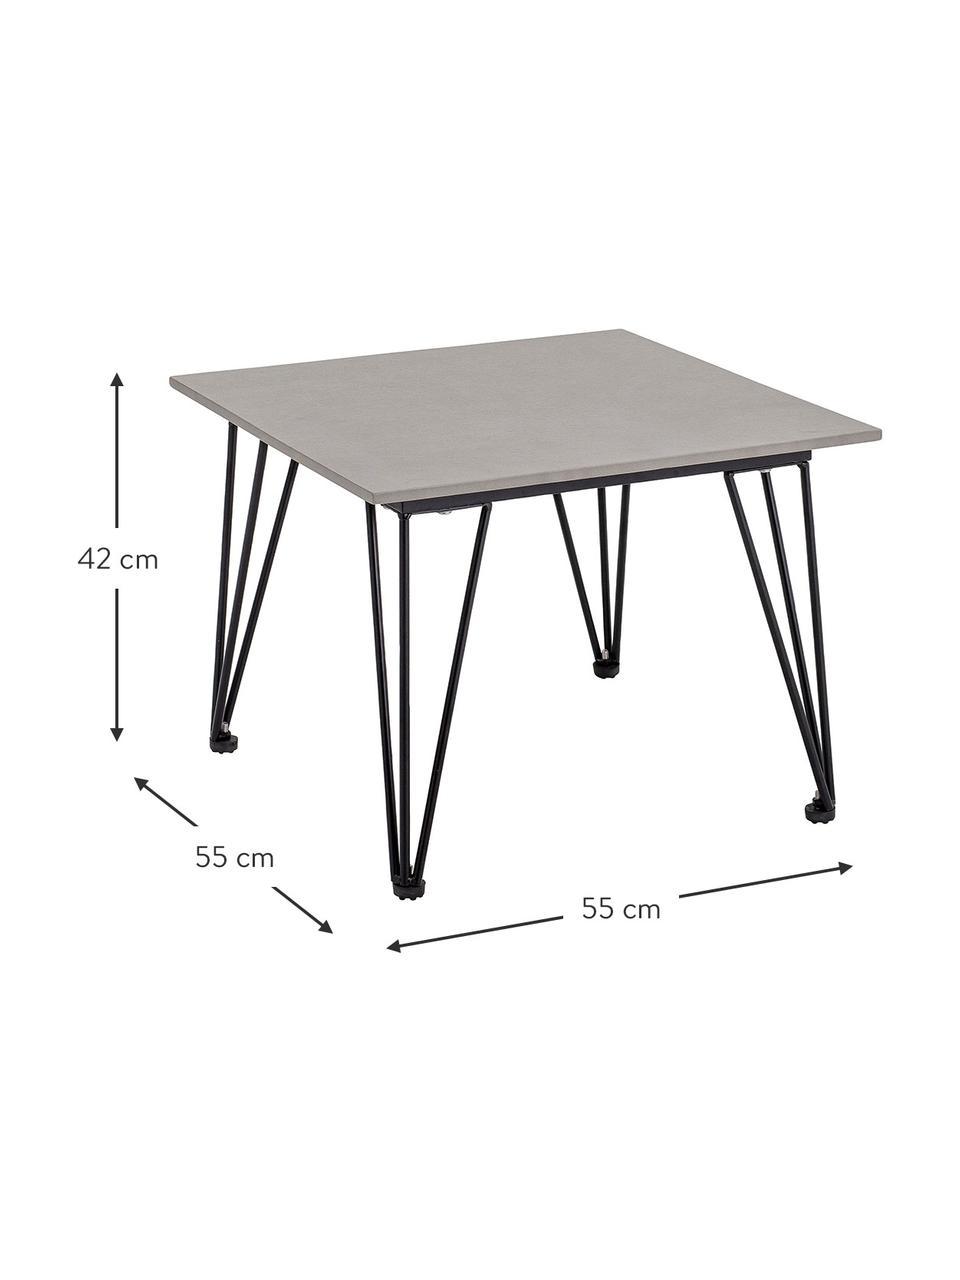 Table de jardin béton Mundo, Blanc, gris